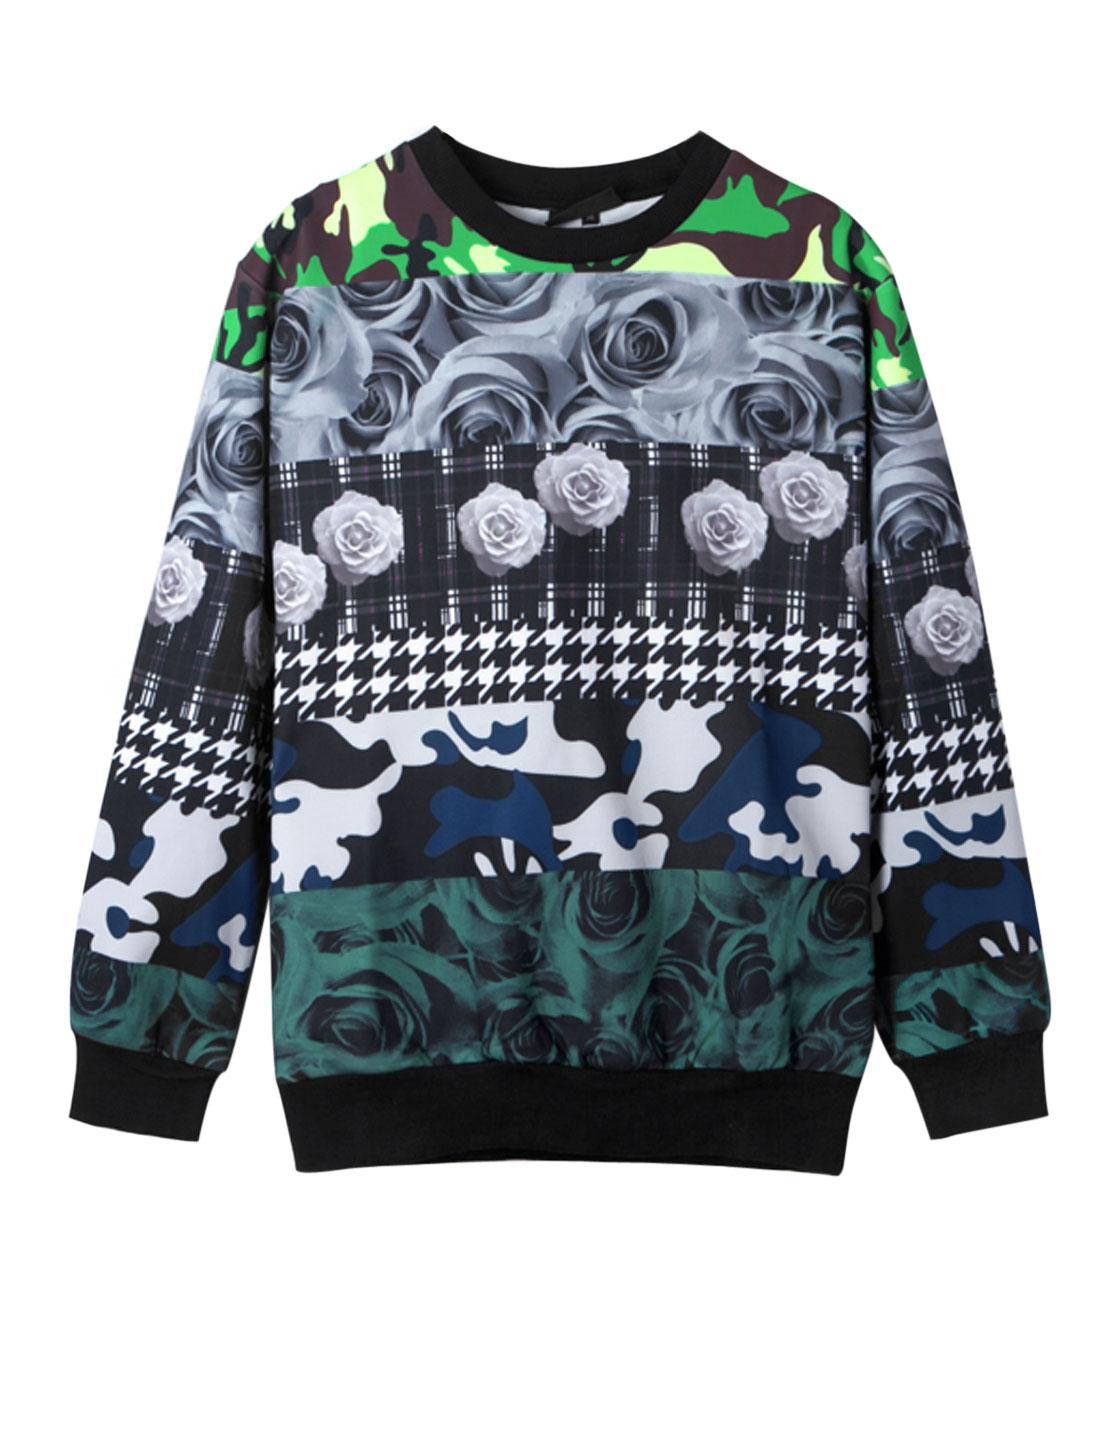 Men Ribbed Trim Rose Camo Print All Over Print Casual Sweatshirt Multicolor M